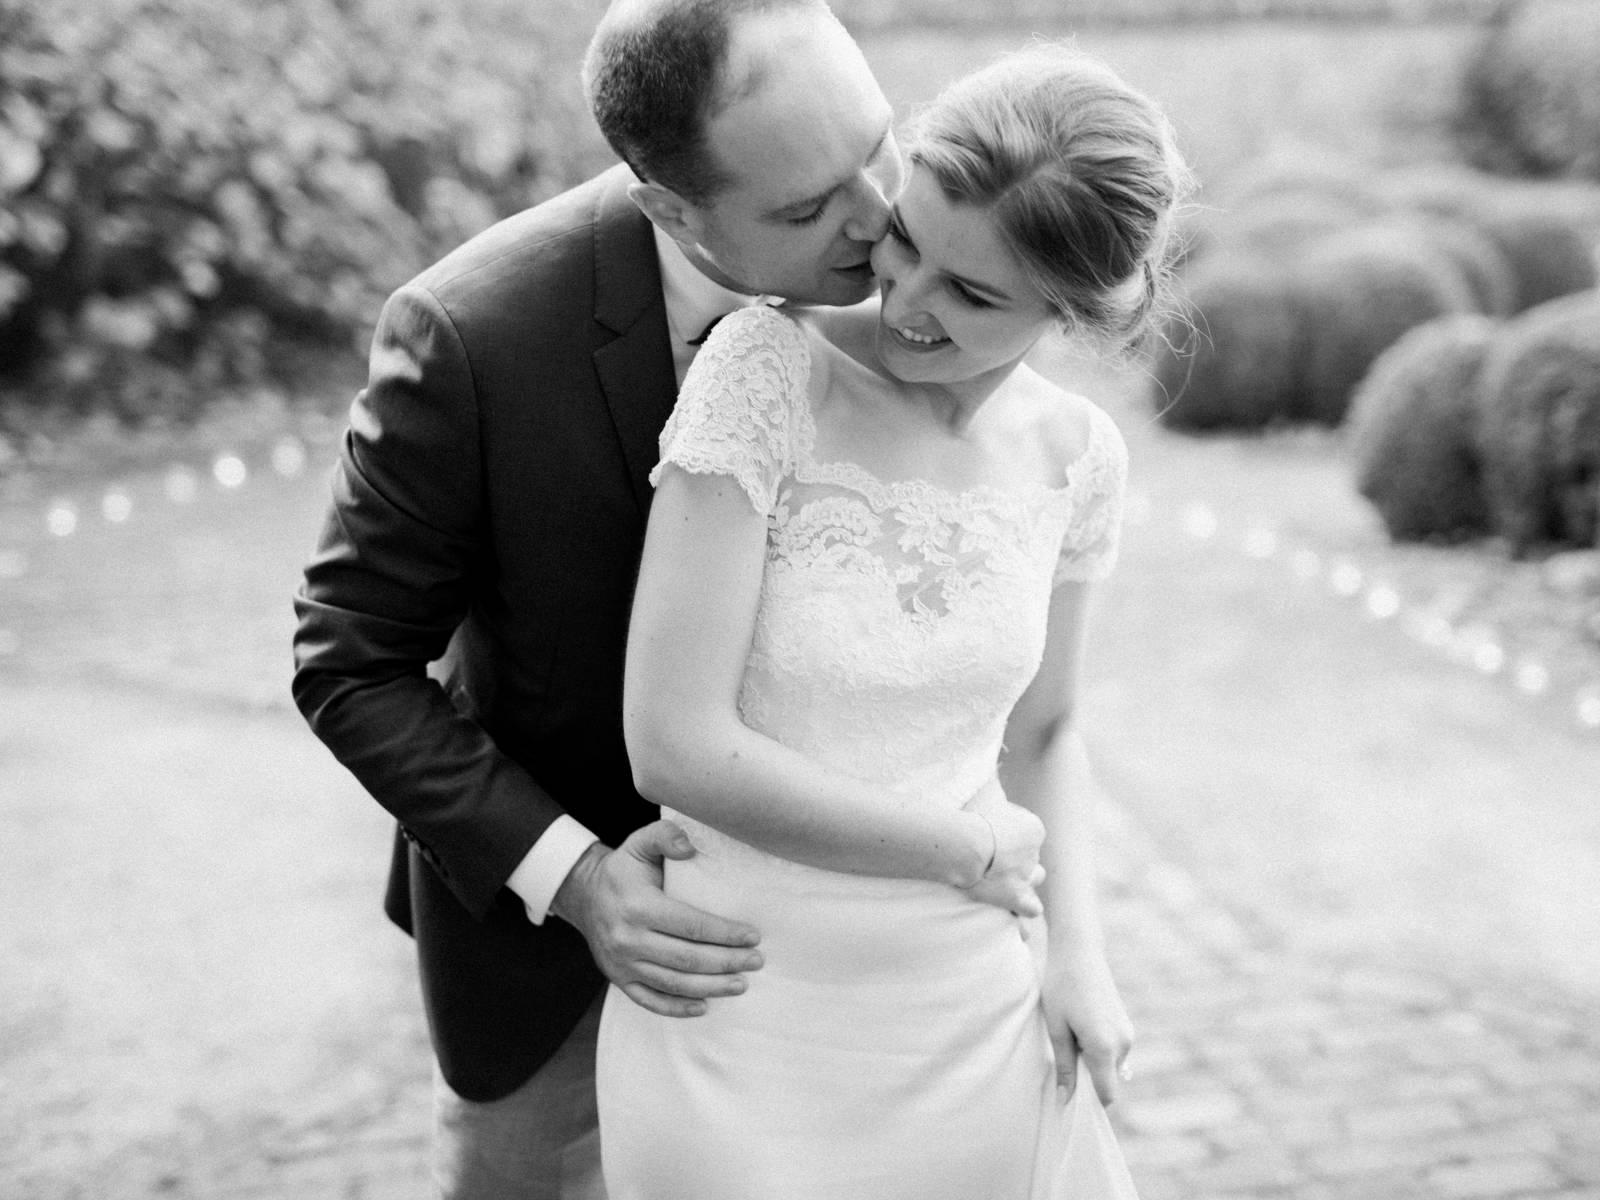 Elisabeth Van Lent Fine Art Wedding Photography - Ferme de Balingue wedding-23